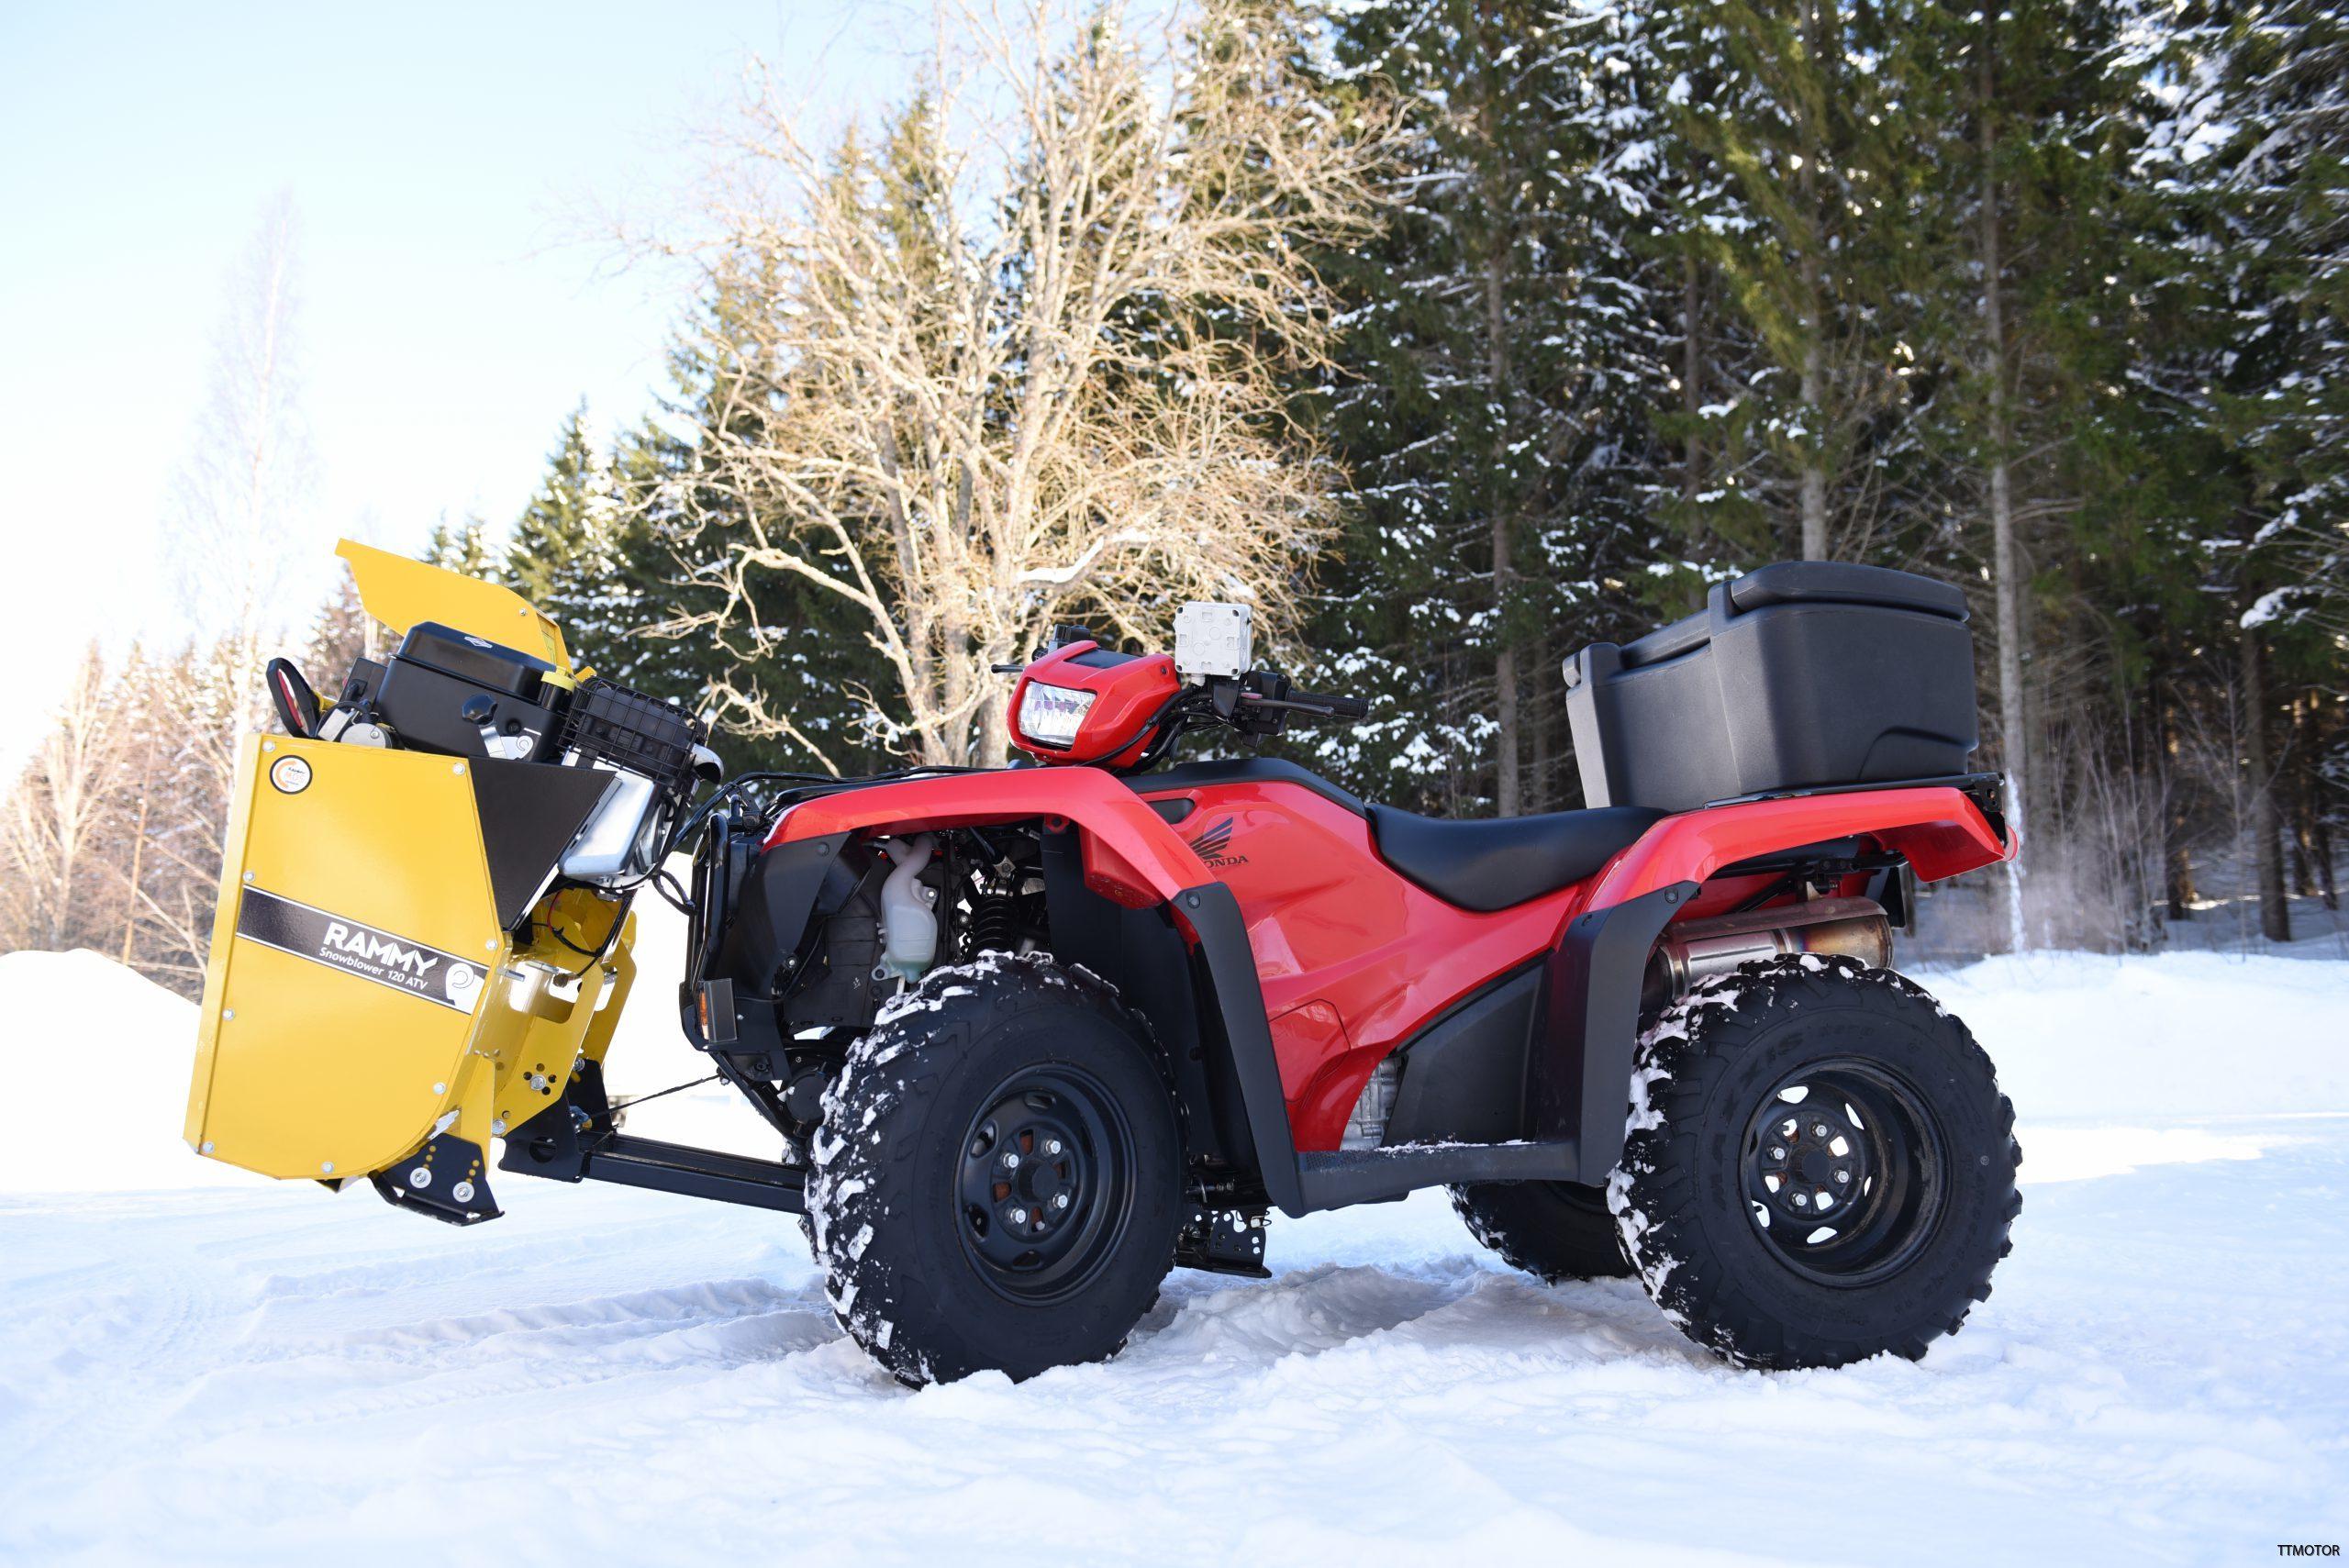 Rammy-Snowblower-EC-120-ATV-2019-6